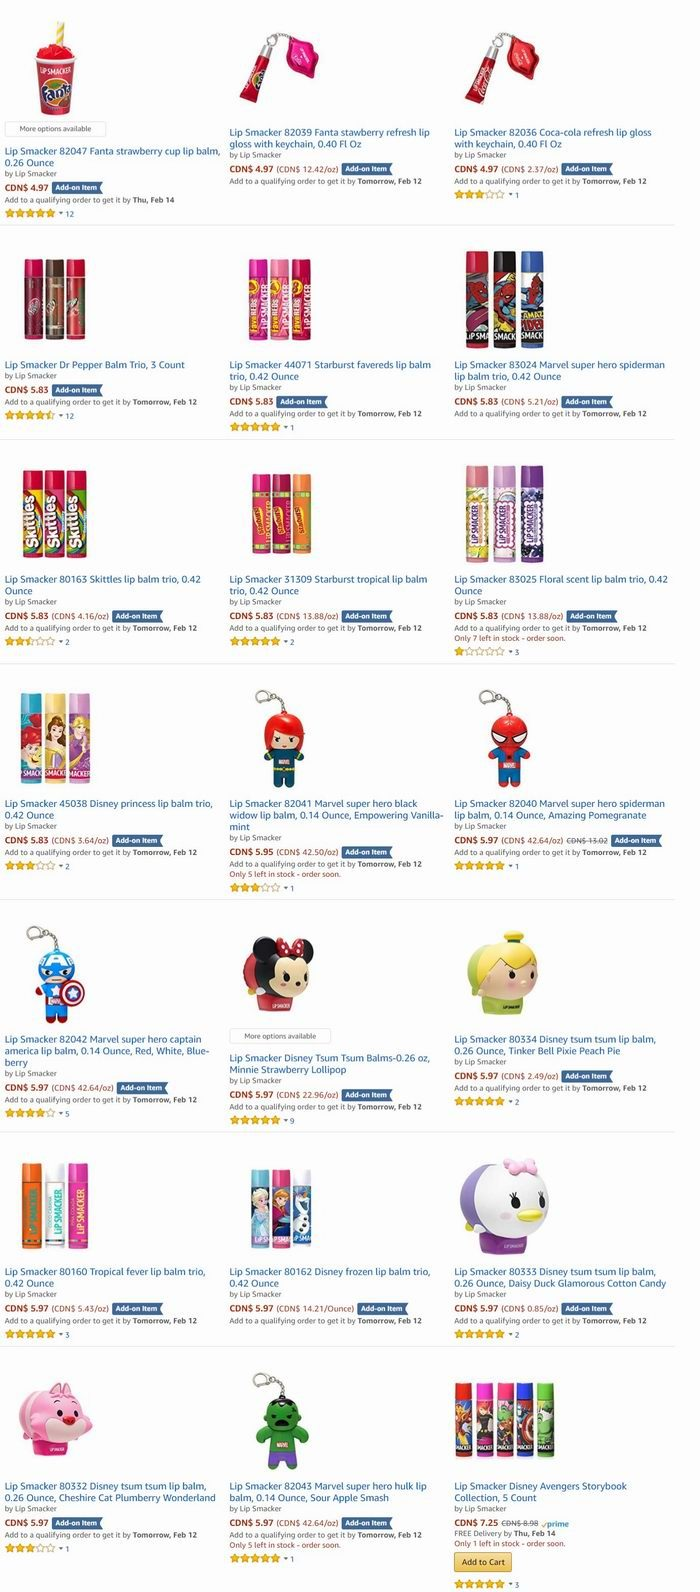 Lip Smacker 迪士尼卡通造型 Tsum Tsum系列润唇膏 4.97加元起特卖!多款可选!